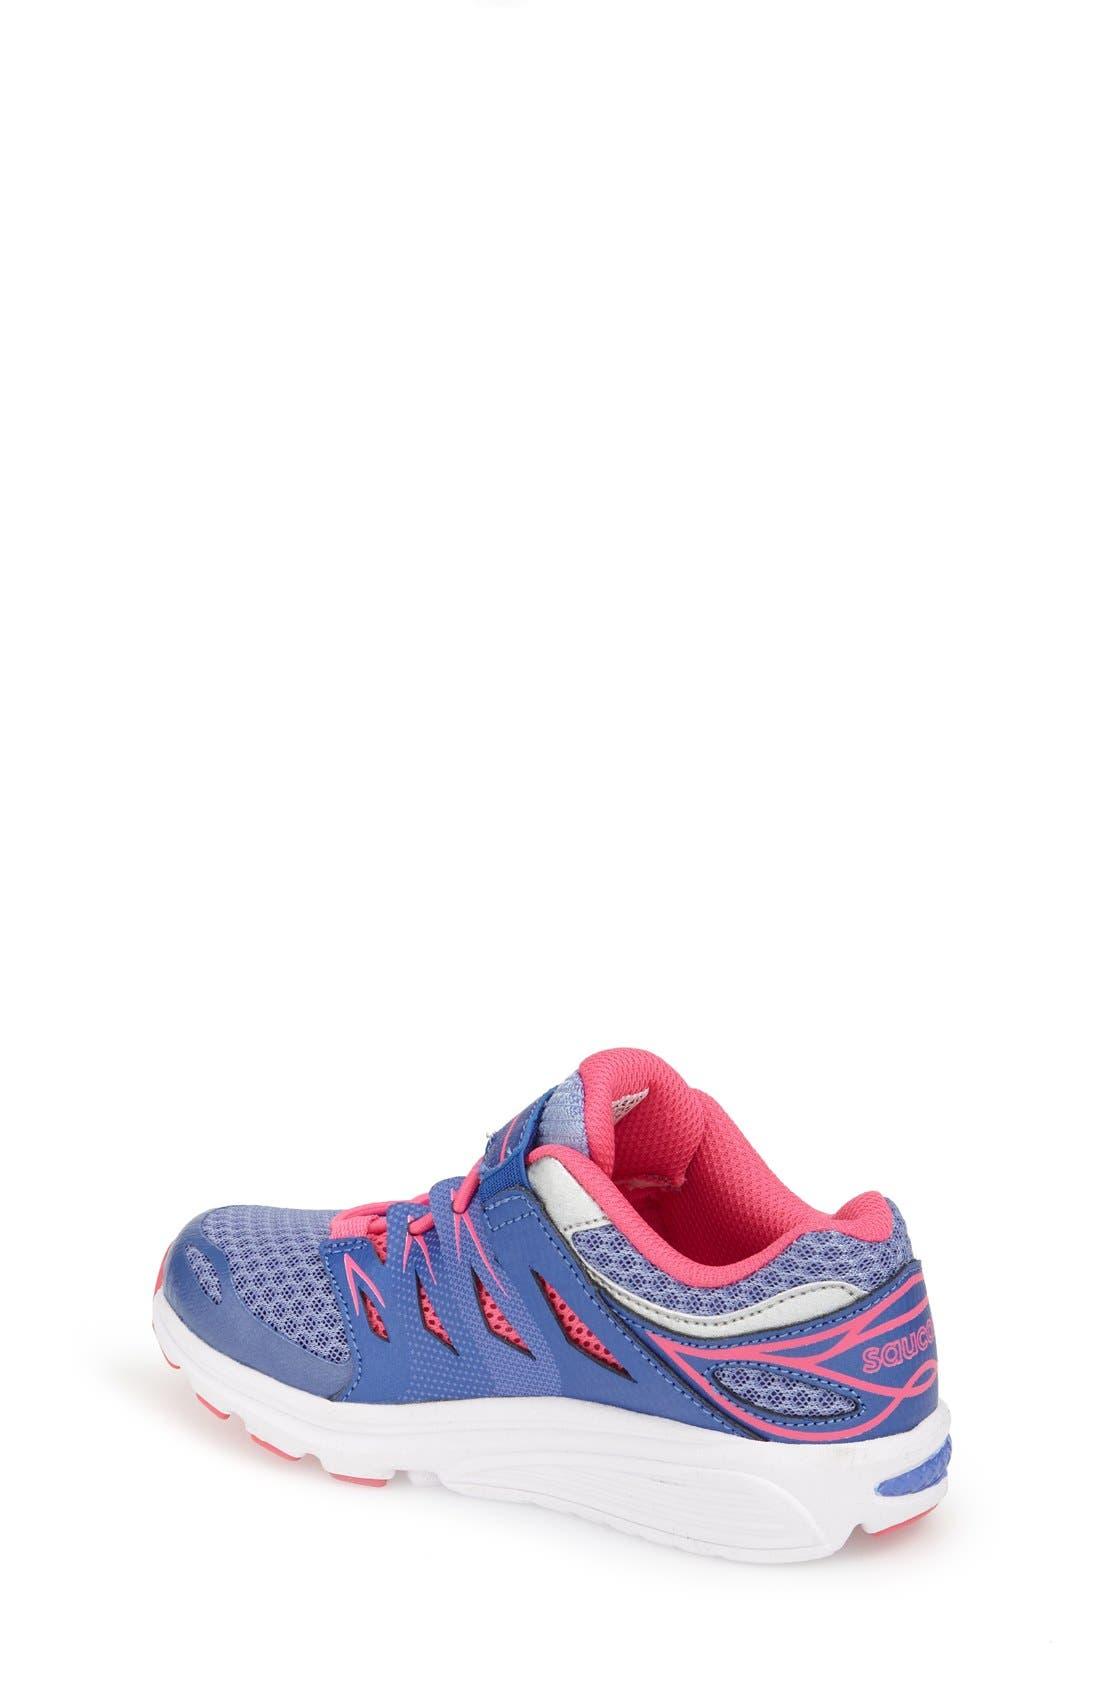 'Zealot 2 AC' Sneaker,                             Alternate thumbnail 2, color,                             400